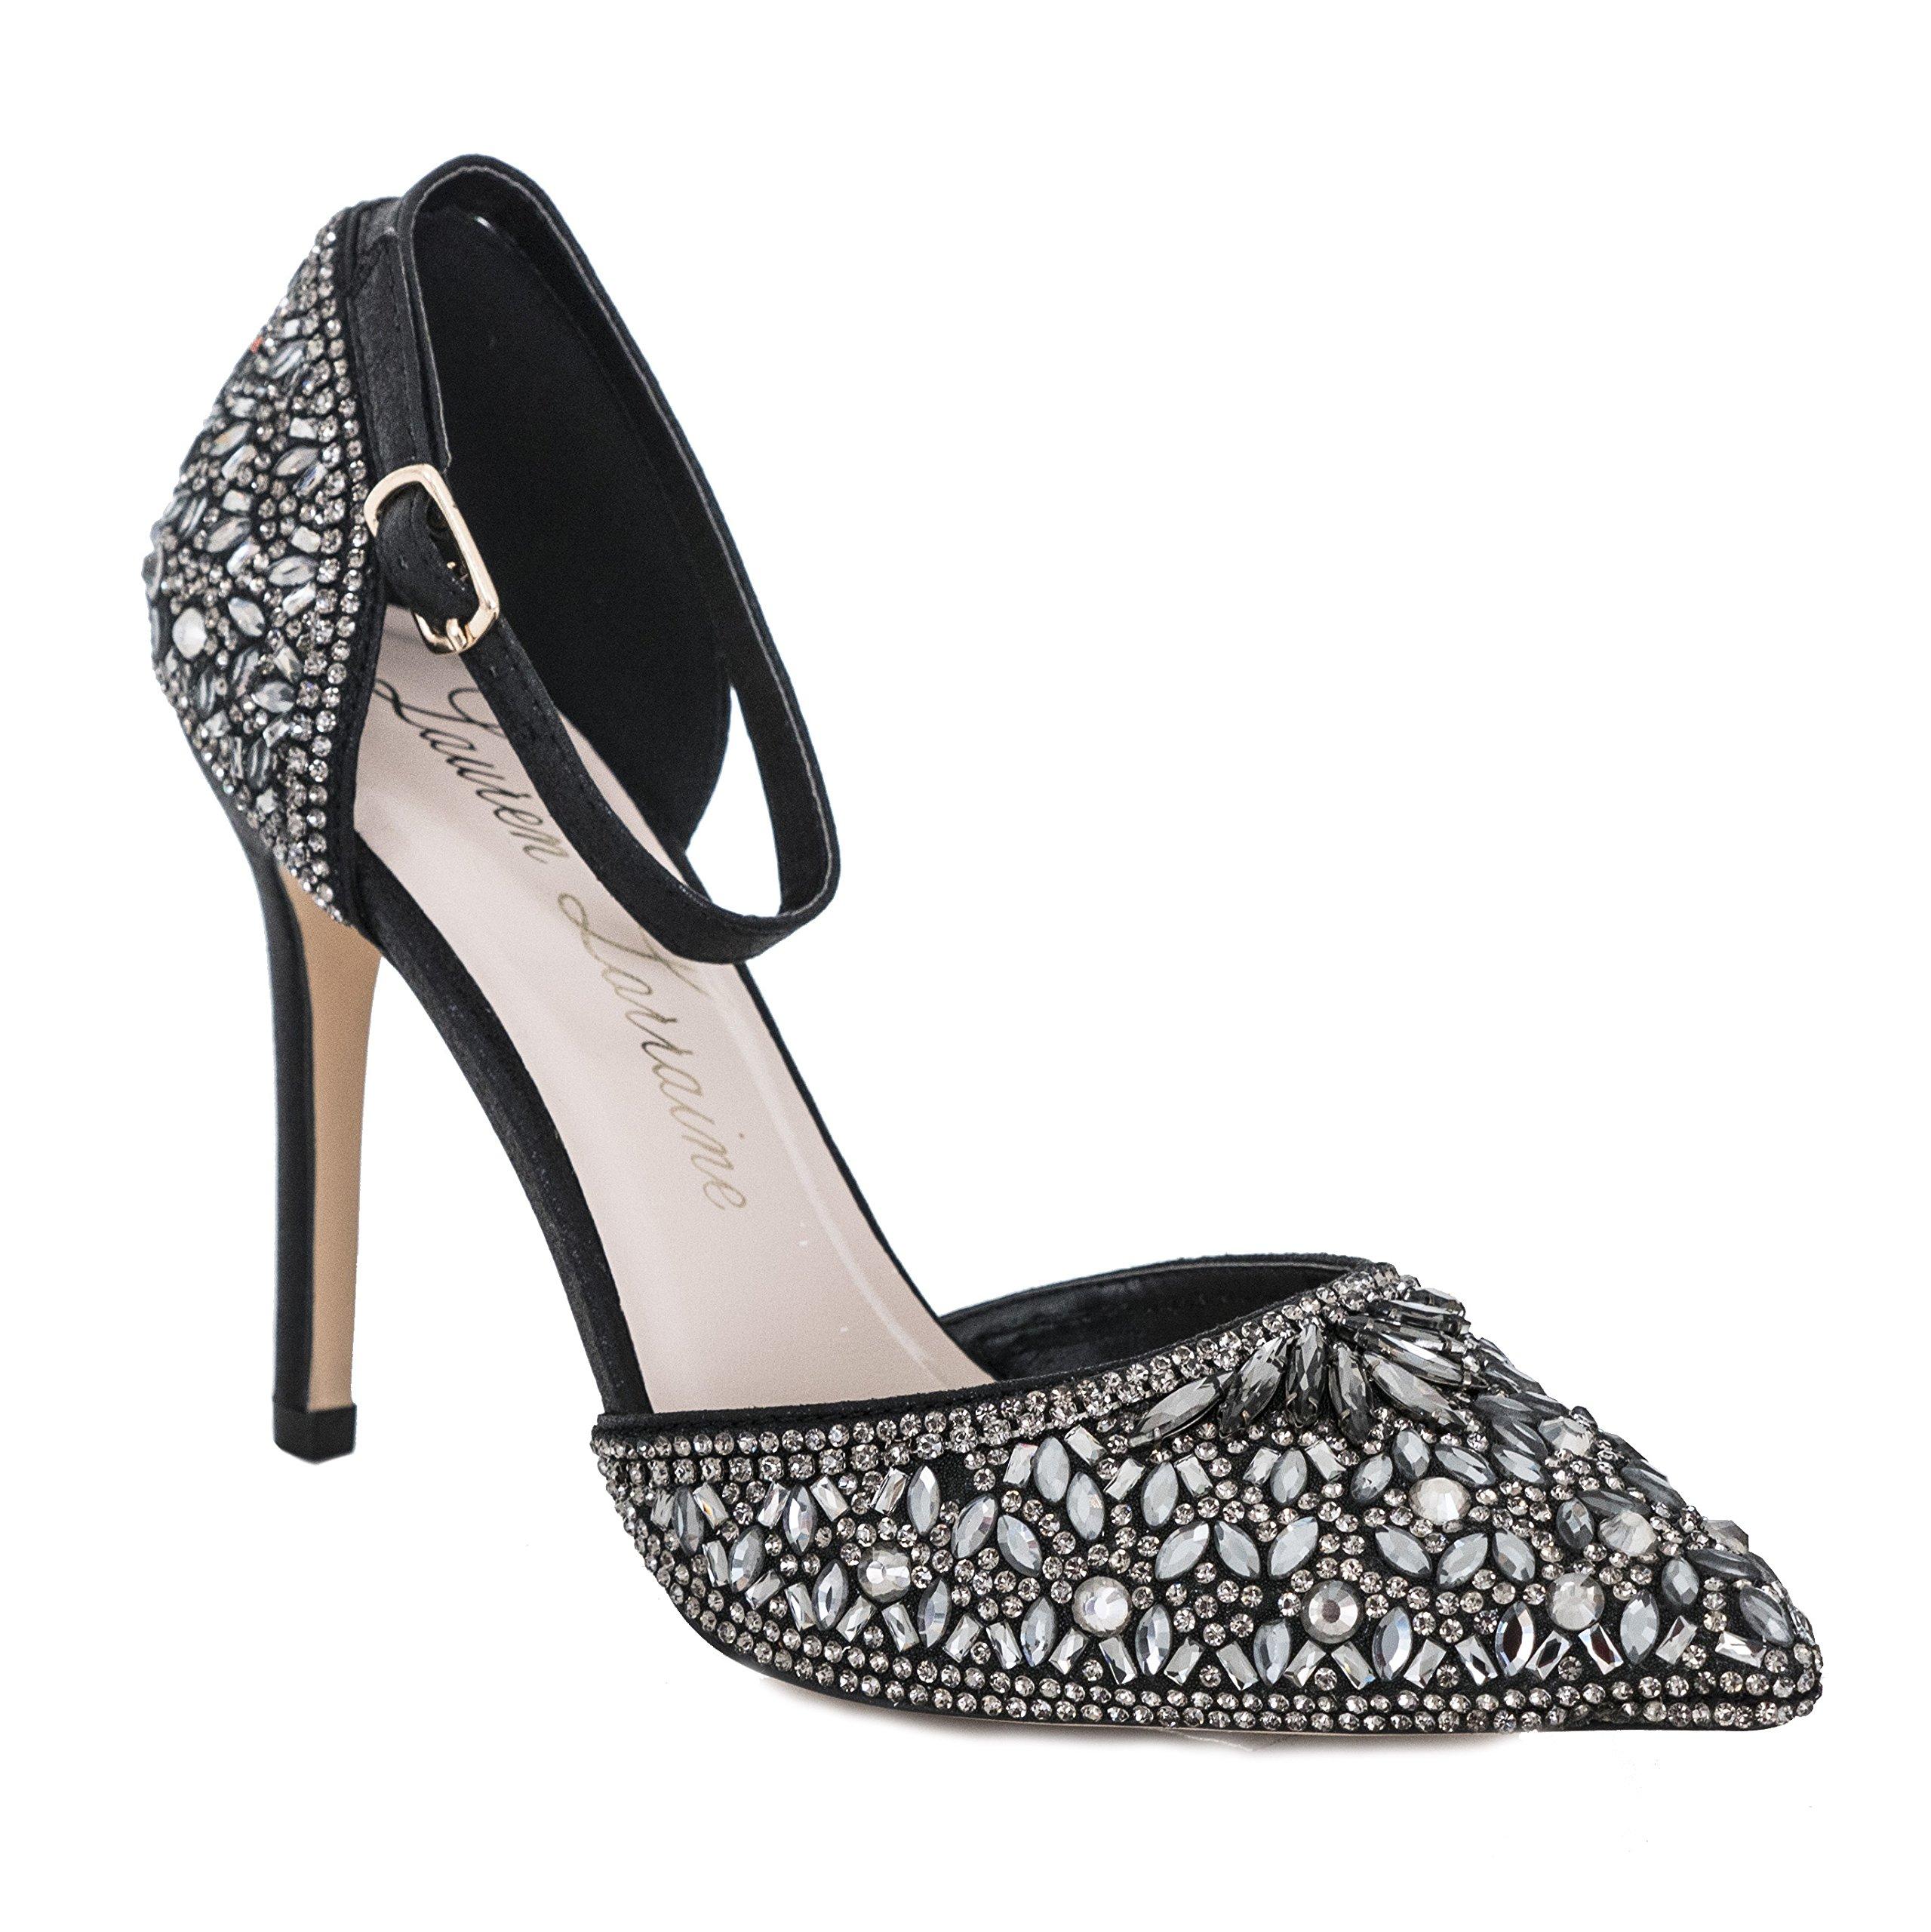 Lauren Lorraine Rose Crystal Black Women's Evening Dress High Heel Ankle Strap D'Orsay Pointed Toe Wedding Pump Black Size 6.5